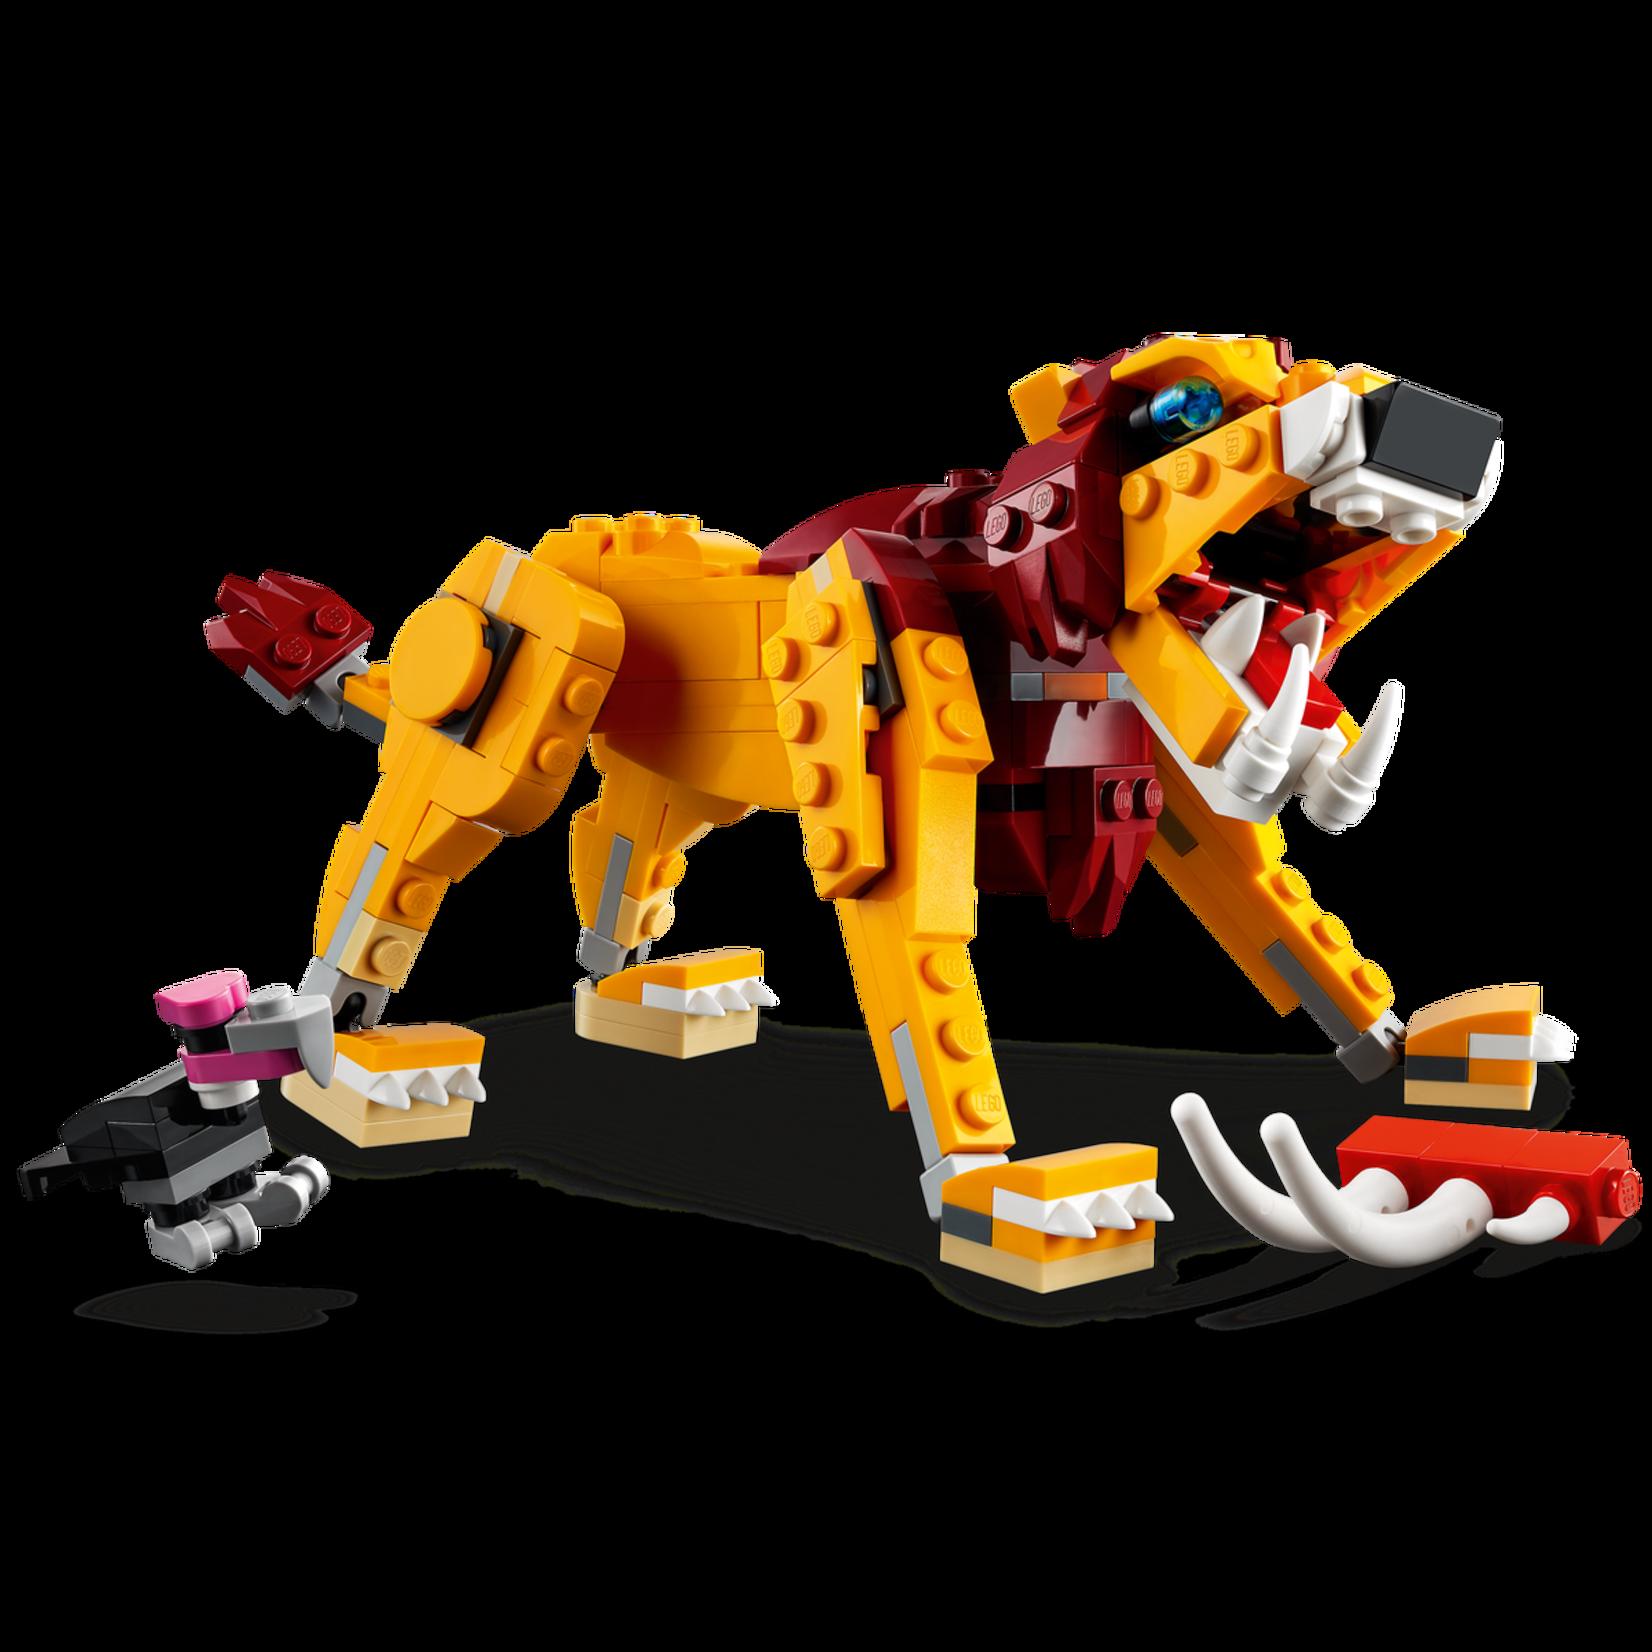 LEGO LEGO Creator: Wild Lion